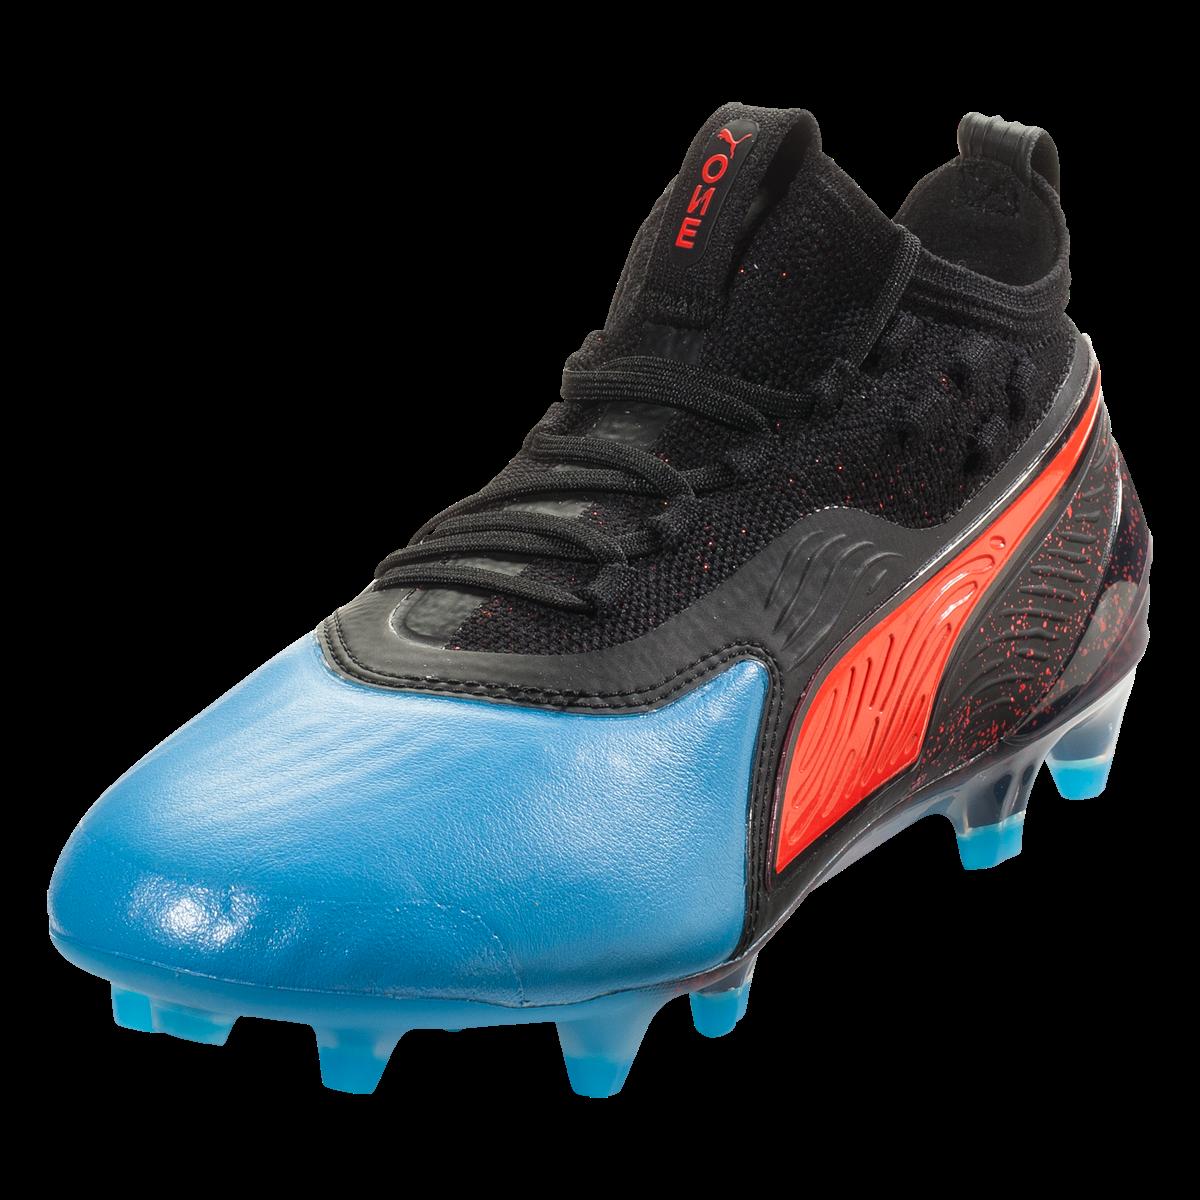 PUMA ONE 19.1 FG/AG Junior Soccer Cleat - Blue Azur/Red ...